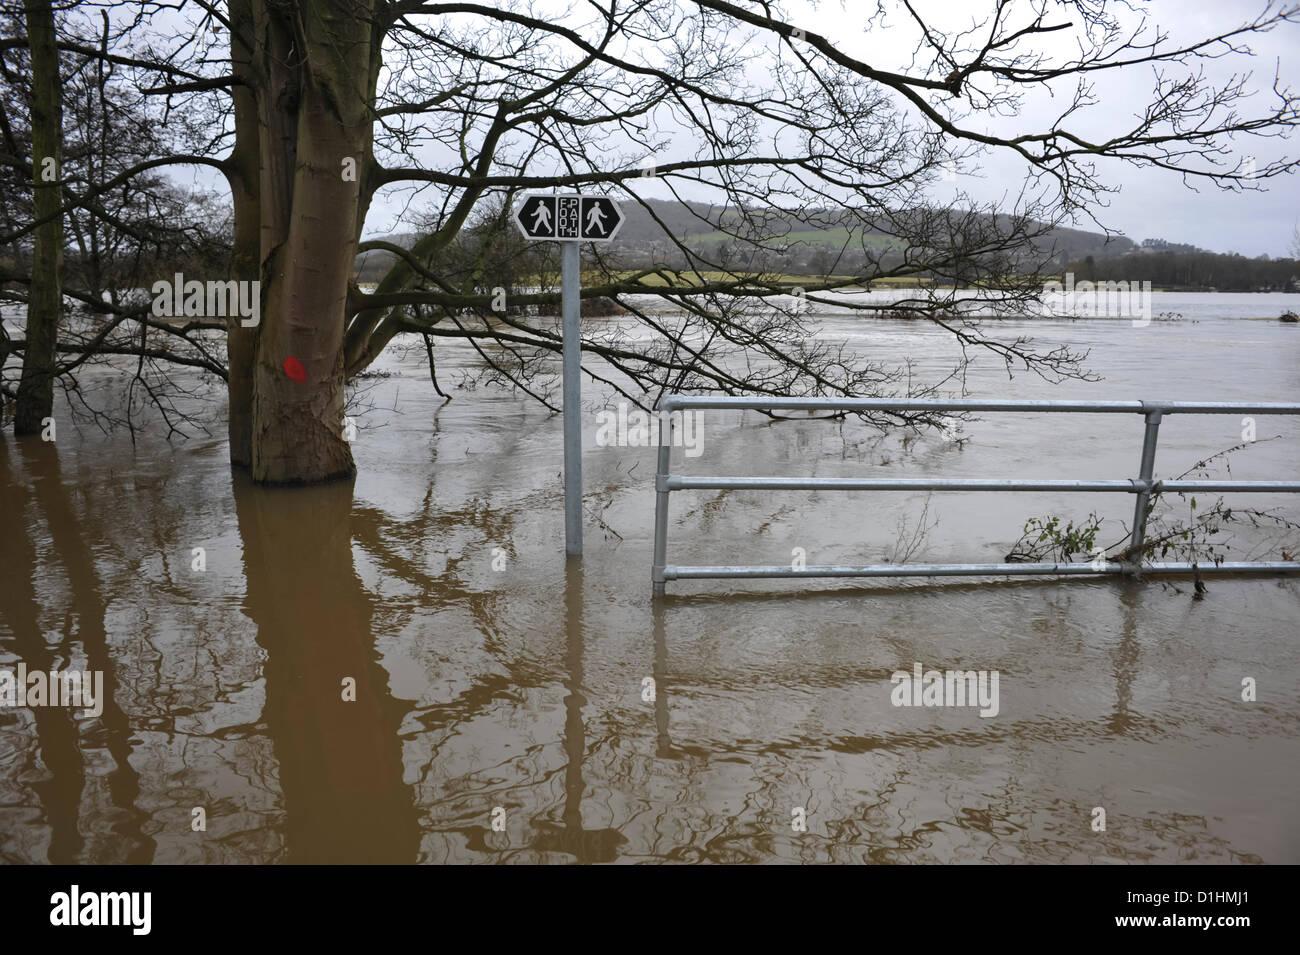 Batheaston,UK. 23rd Dec, 2012. Flooding of the River Avon at Batheaston near Bath renders a riverside footpath unusable Stock Photo